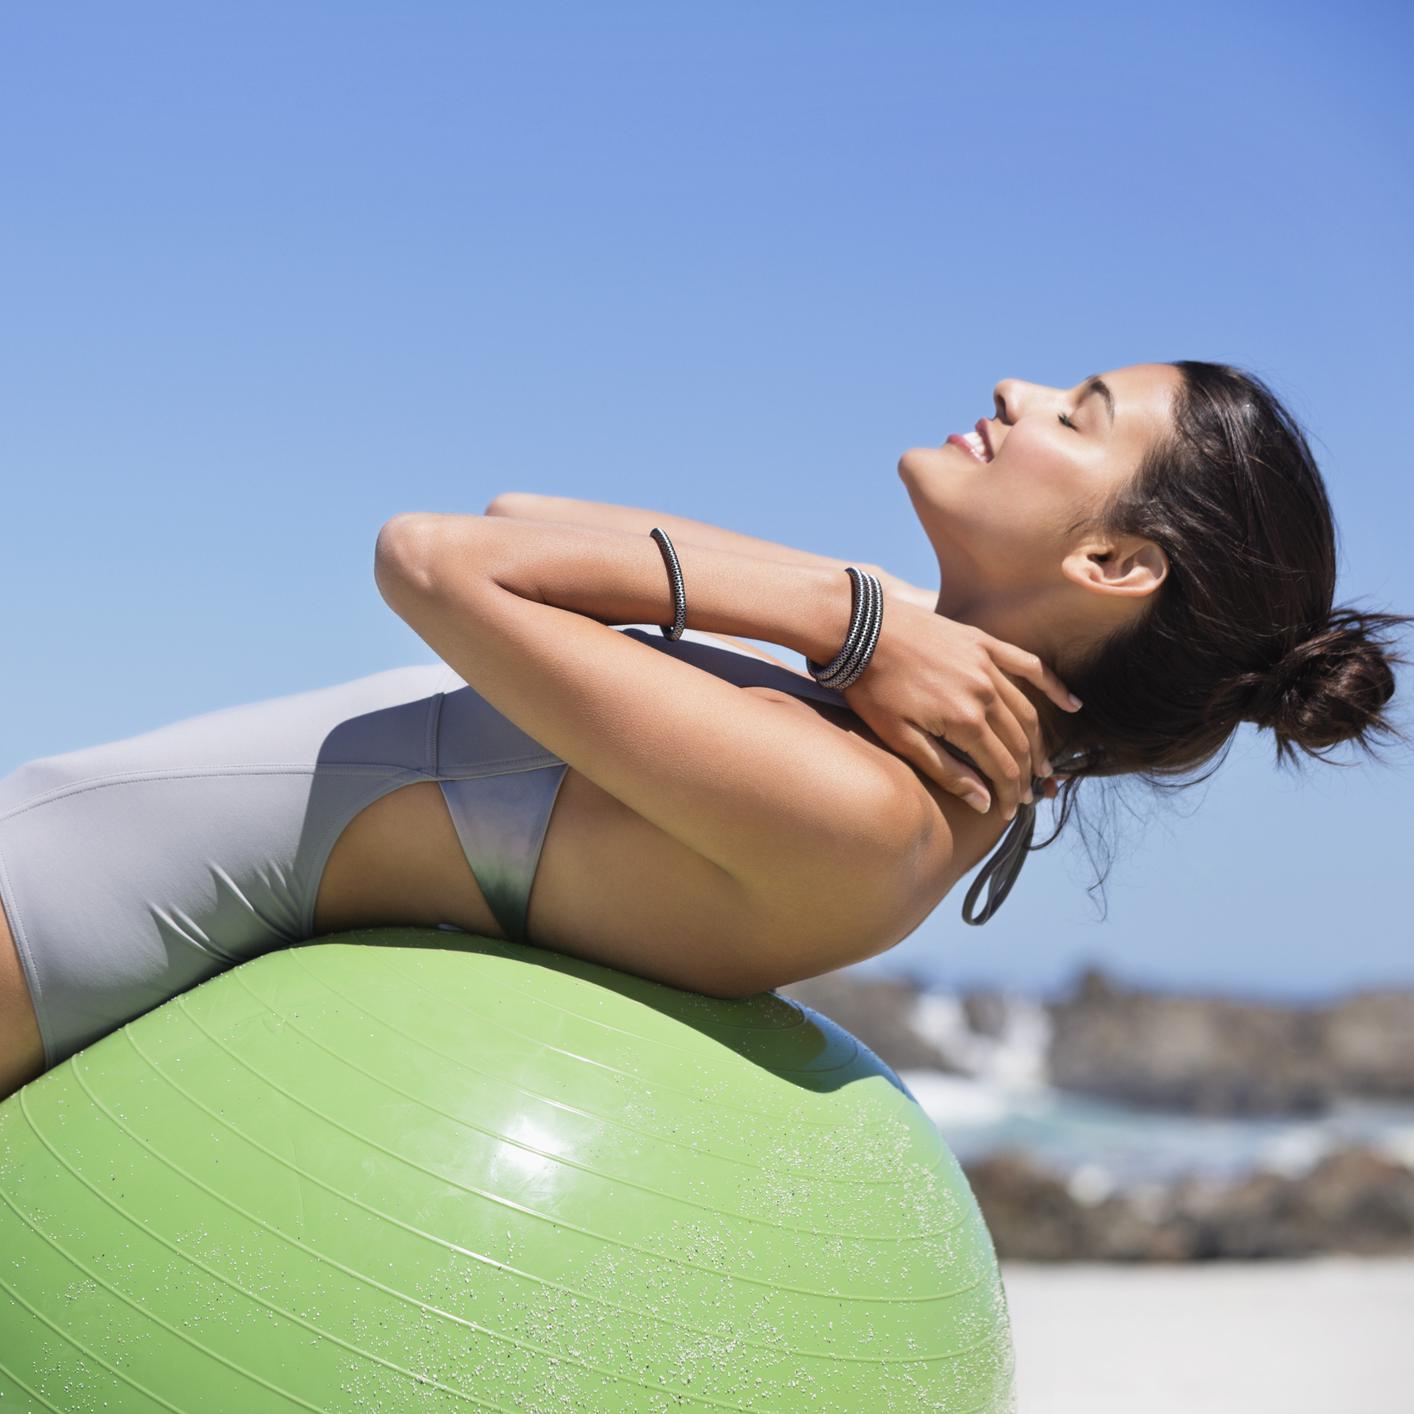 pilates ballon exercice de pilates avec un swiss ball elle. Black Bedroom Furniture Sets. Home Design Ideas